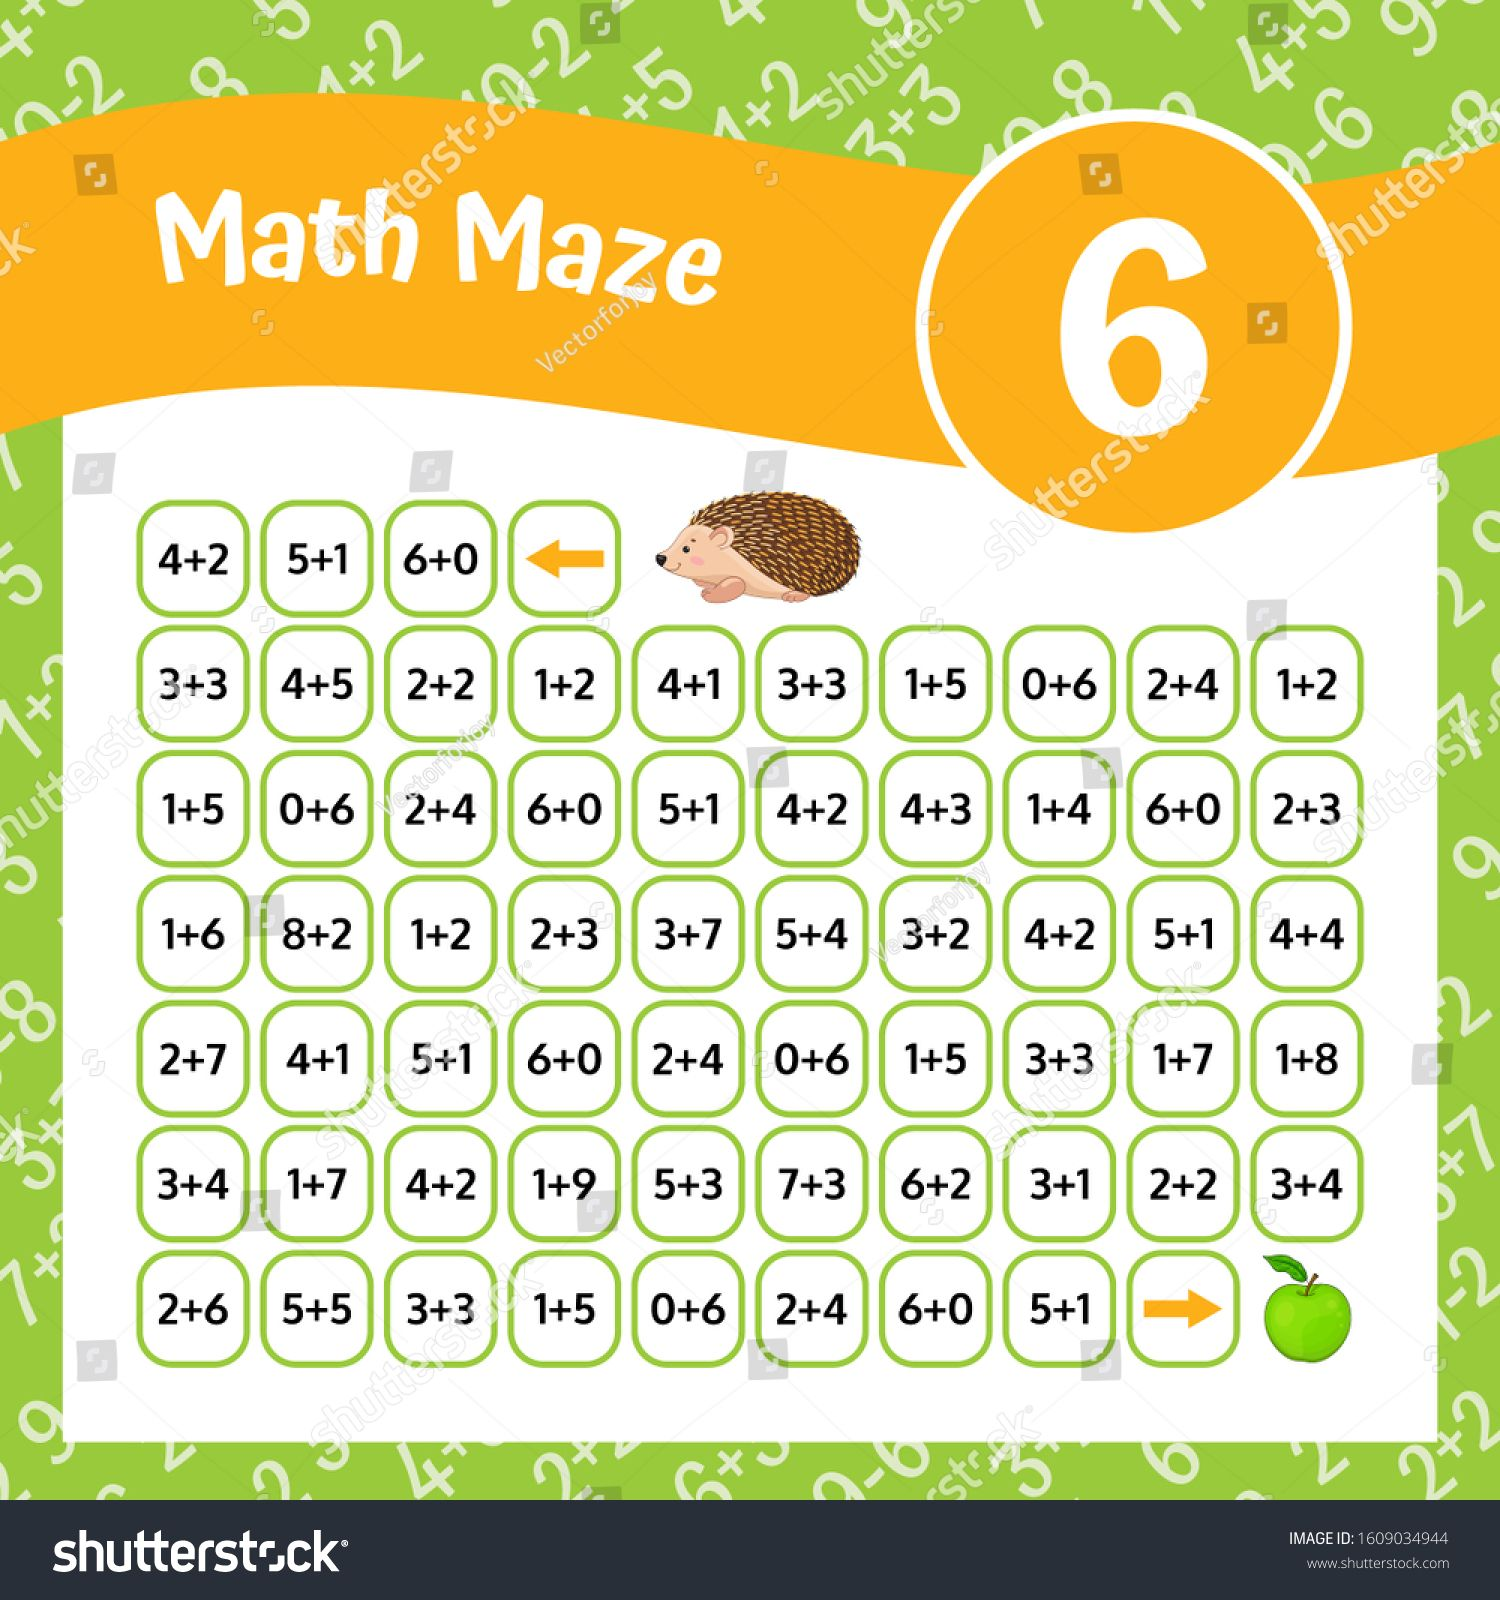 Math Maze Addition Worksheet Educational Game